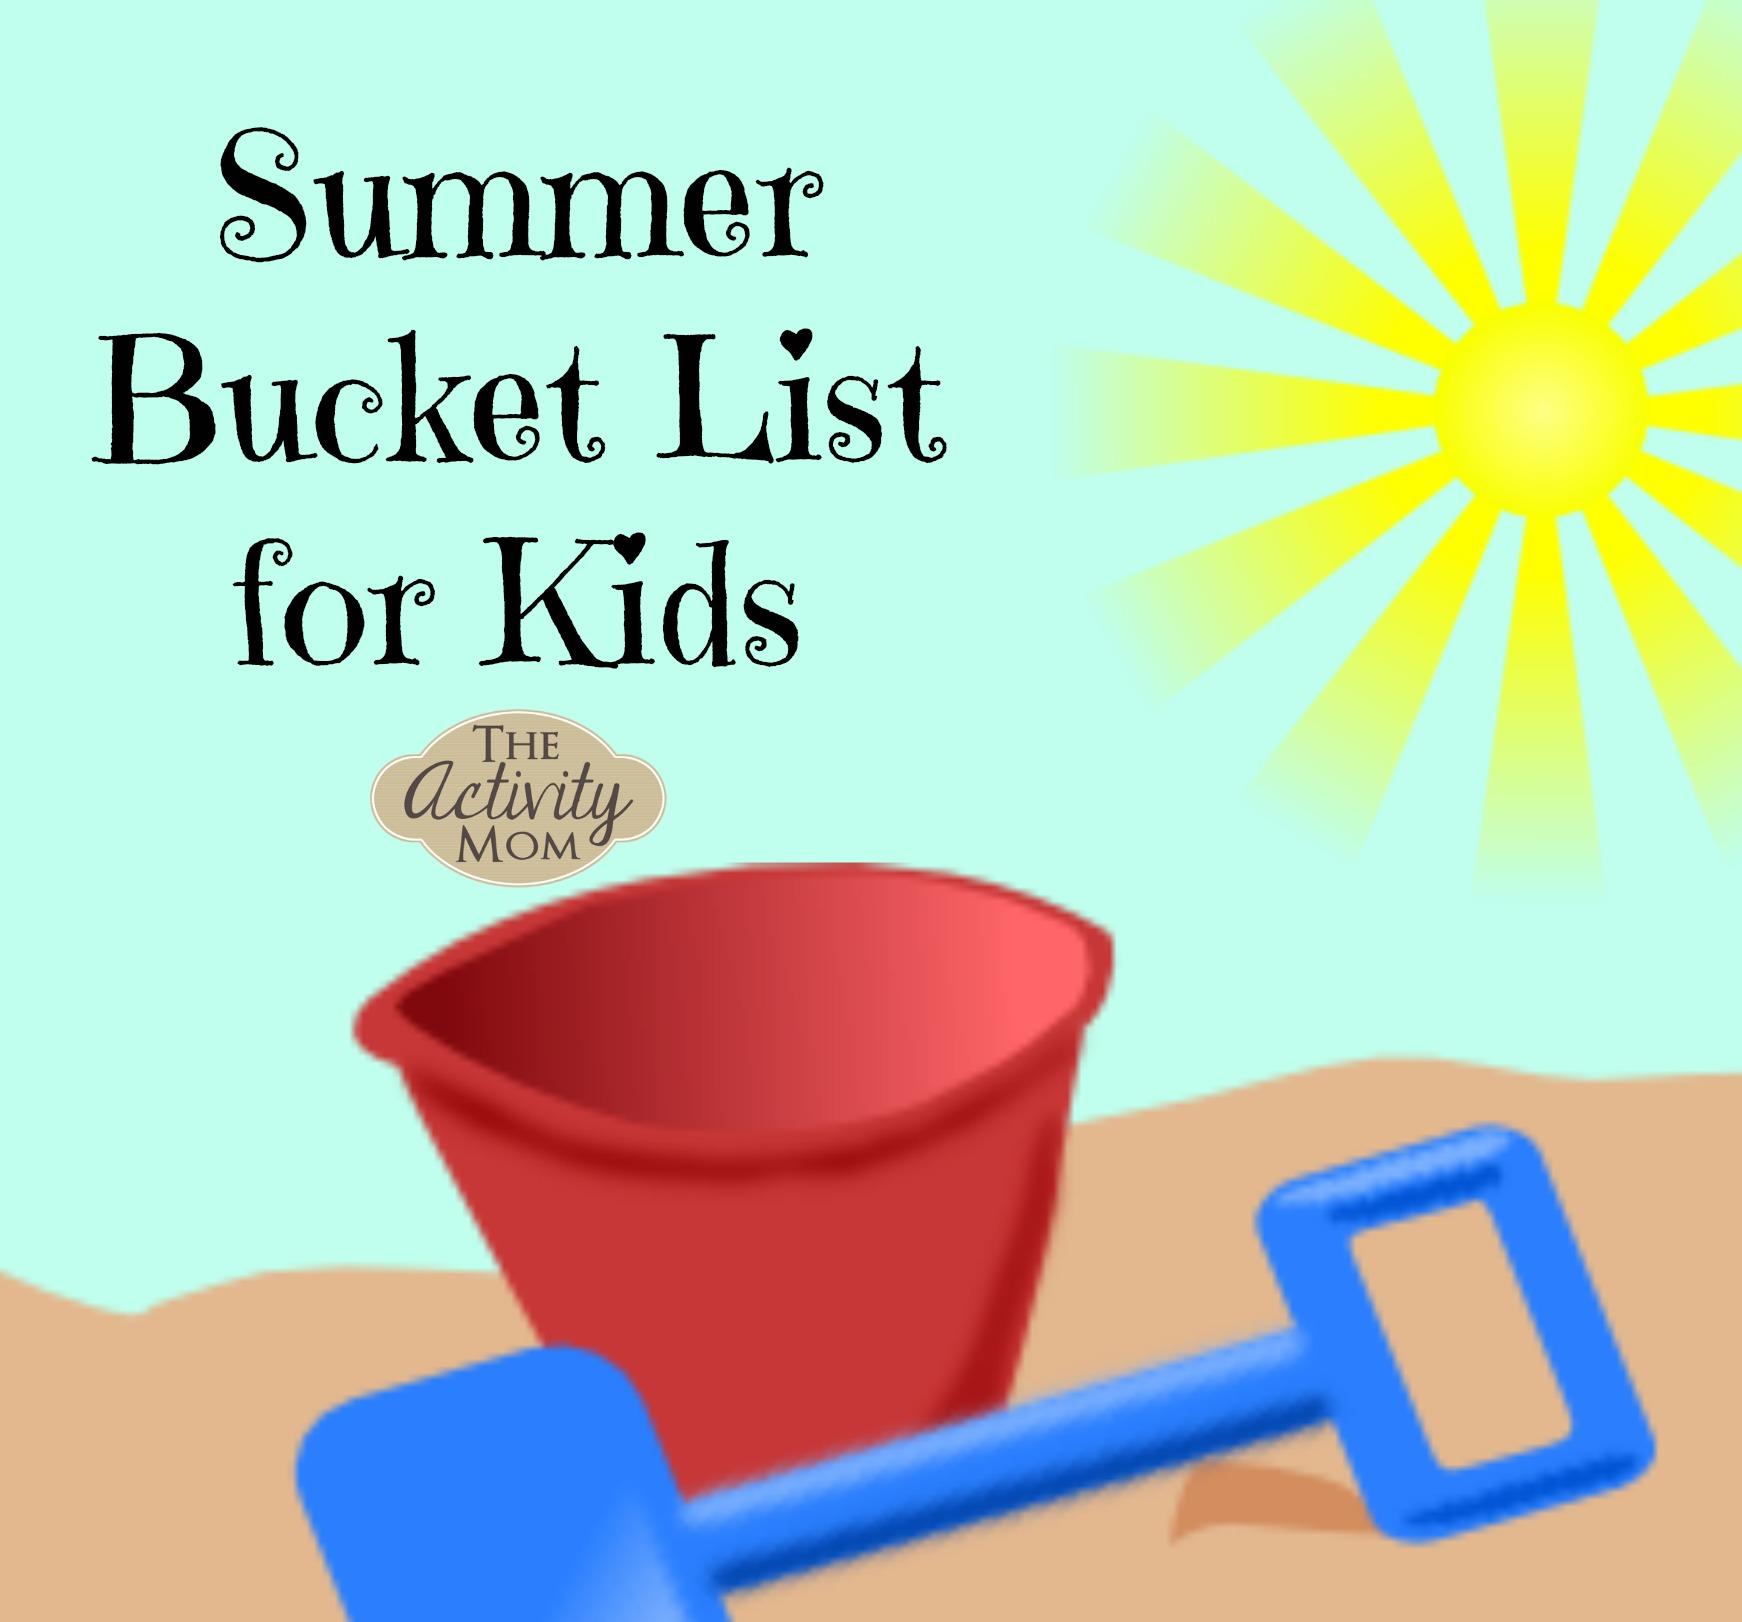 Kids' Summer Bucket List